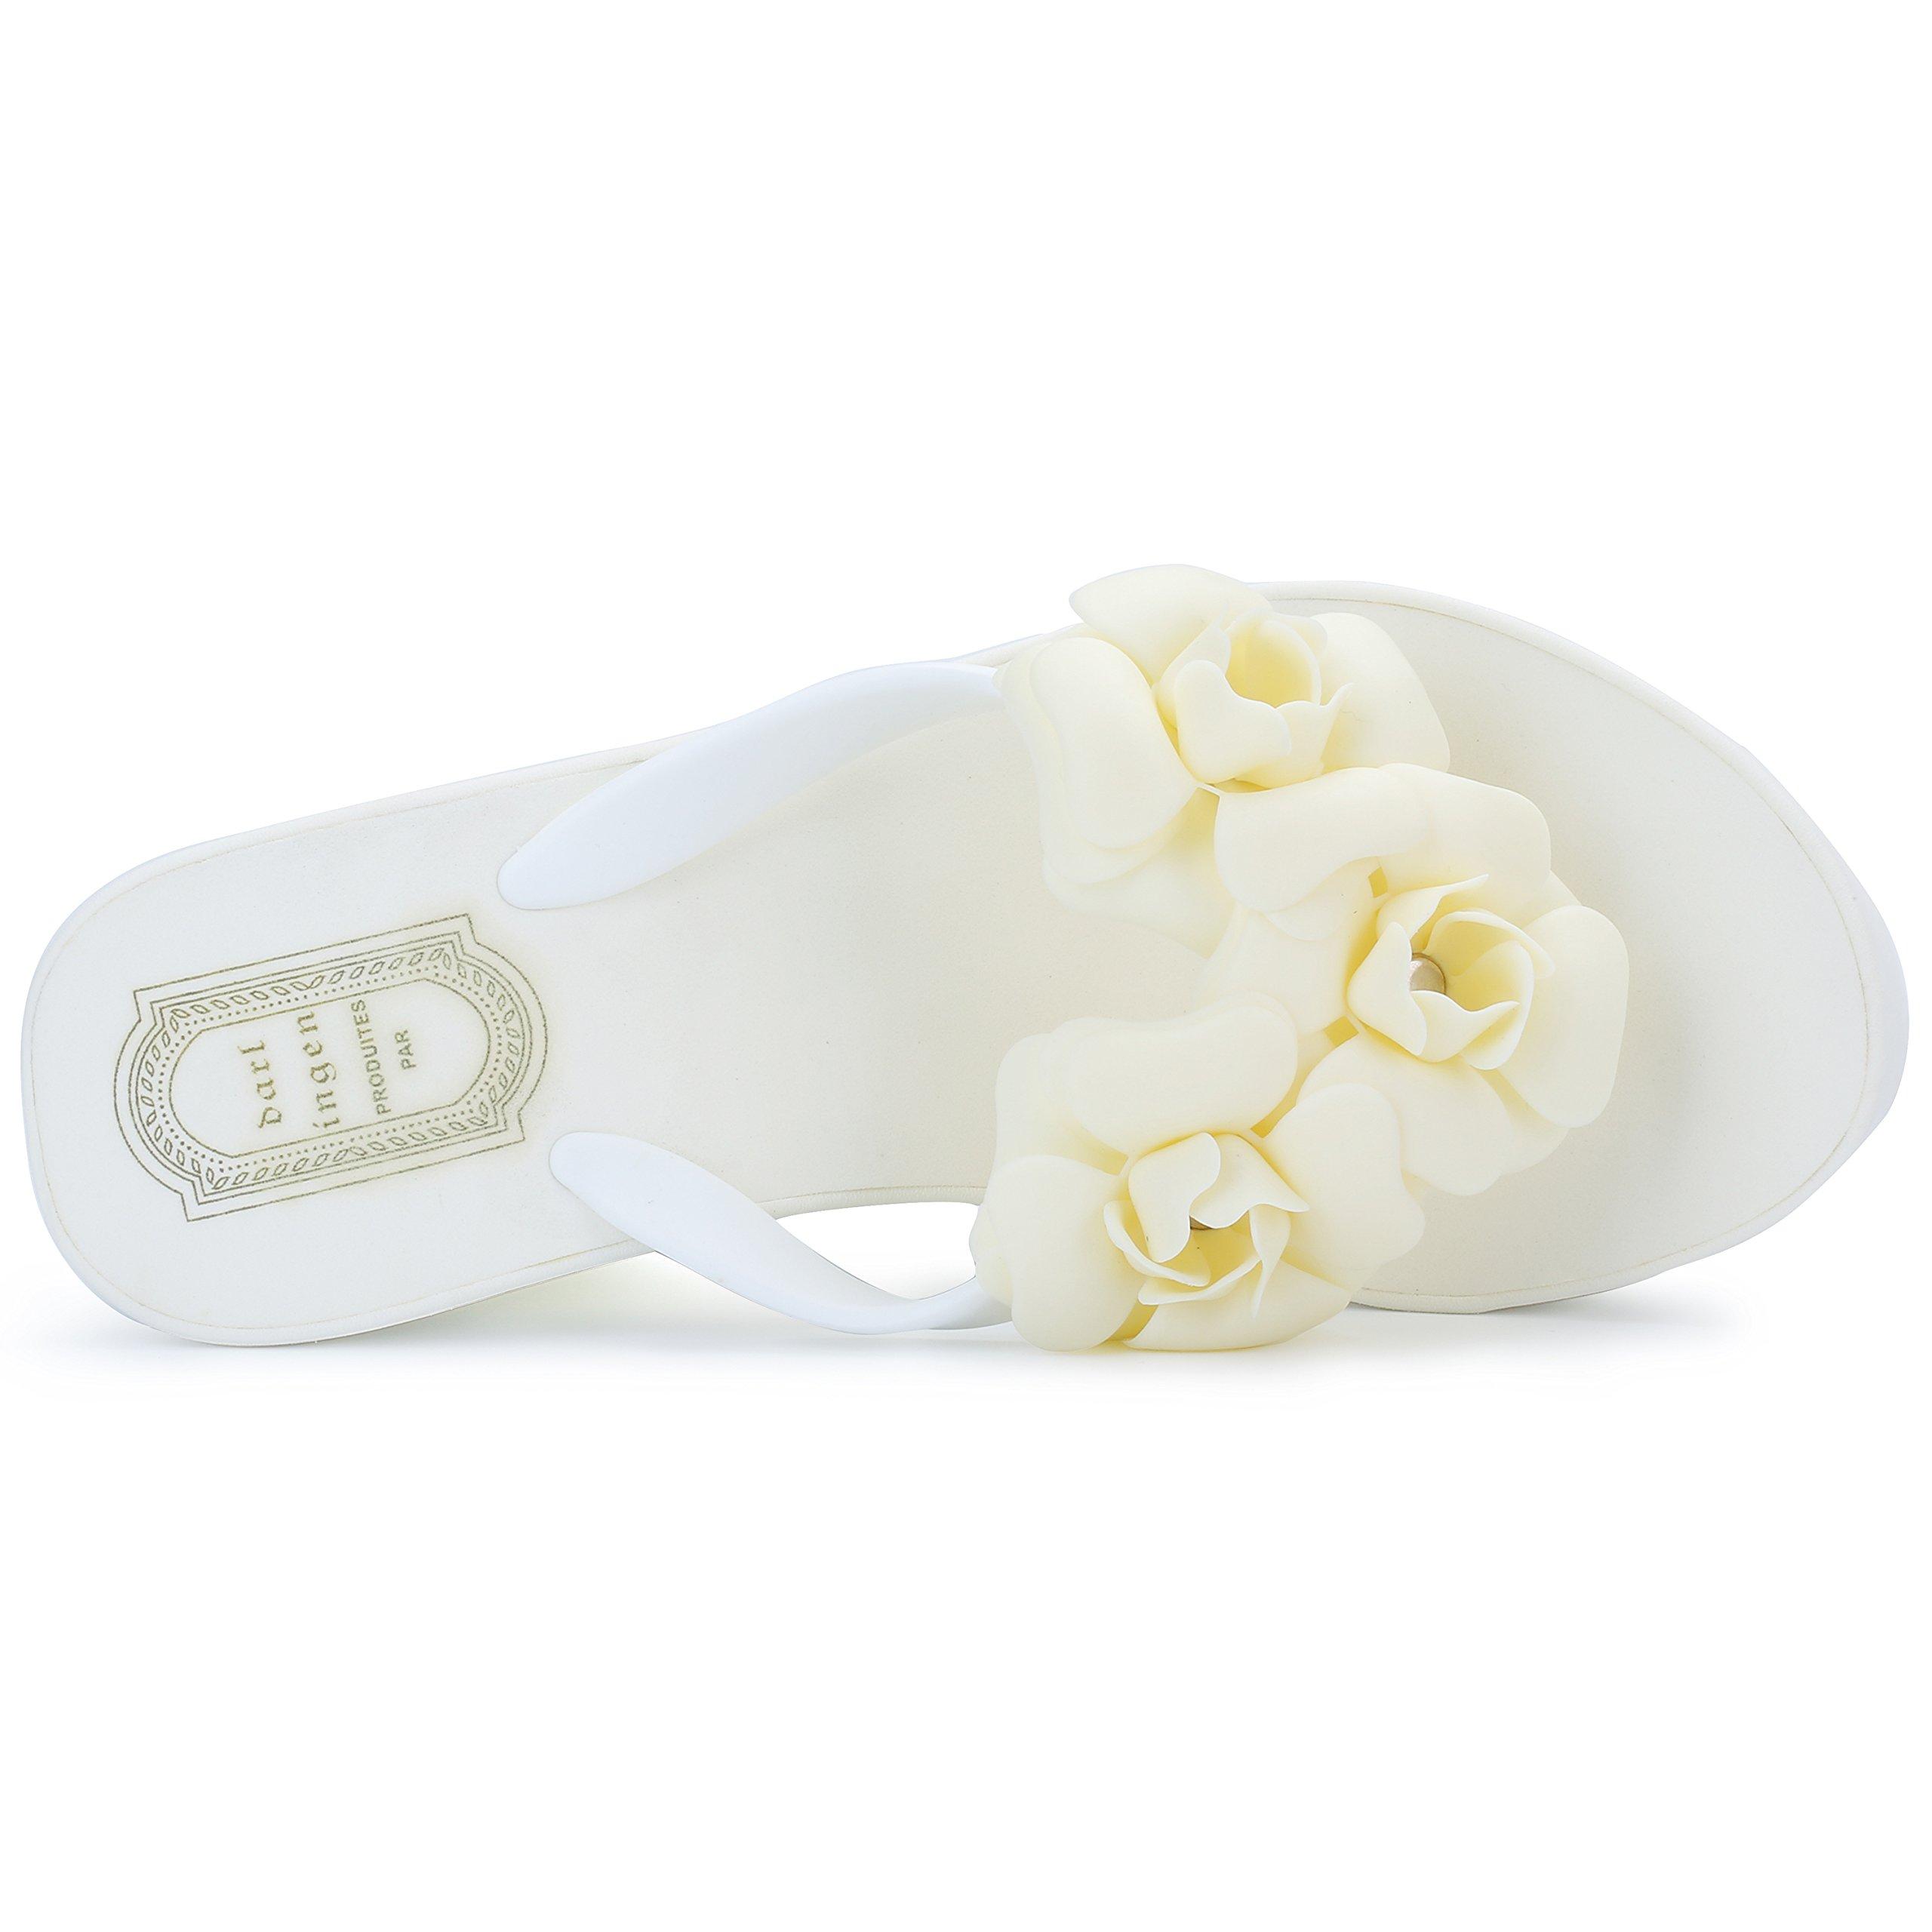 93ed0d5bf568 IDIFU Women s Boho Flowers Wedge Platform Flip Flops Sandy Thong Sandals  Heels   Flip-Flops   Clothing